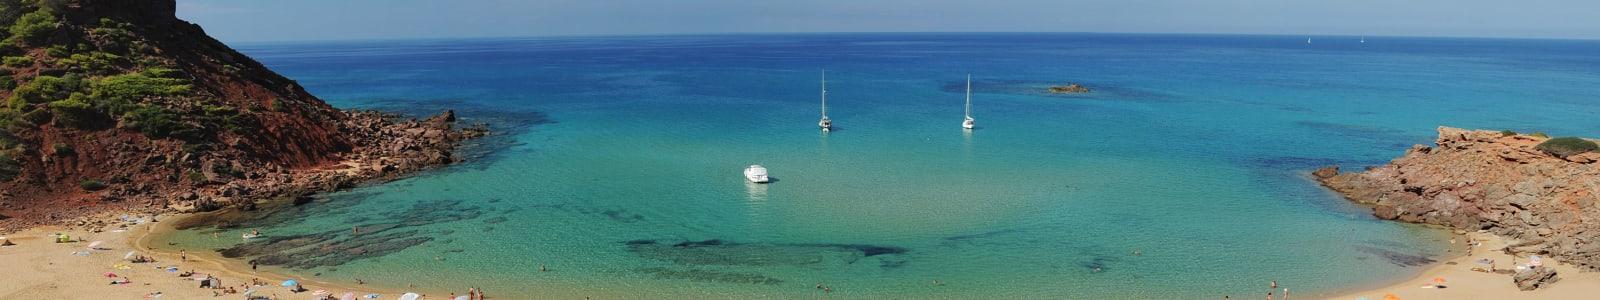 Relaxing Majorcan beach